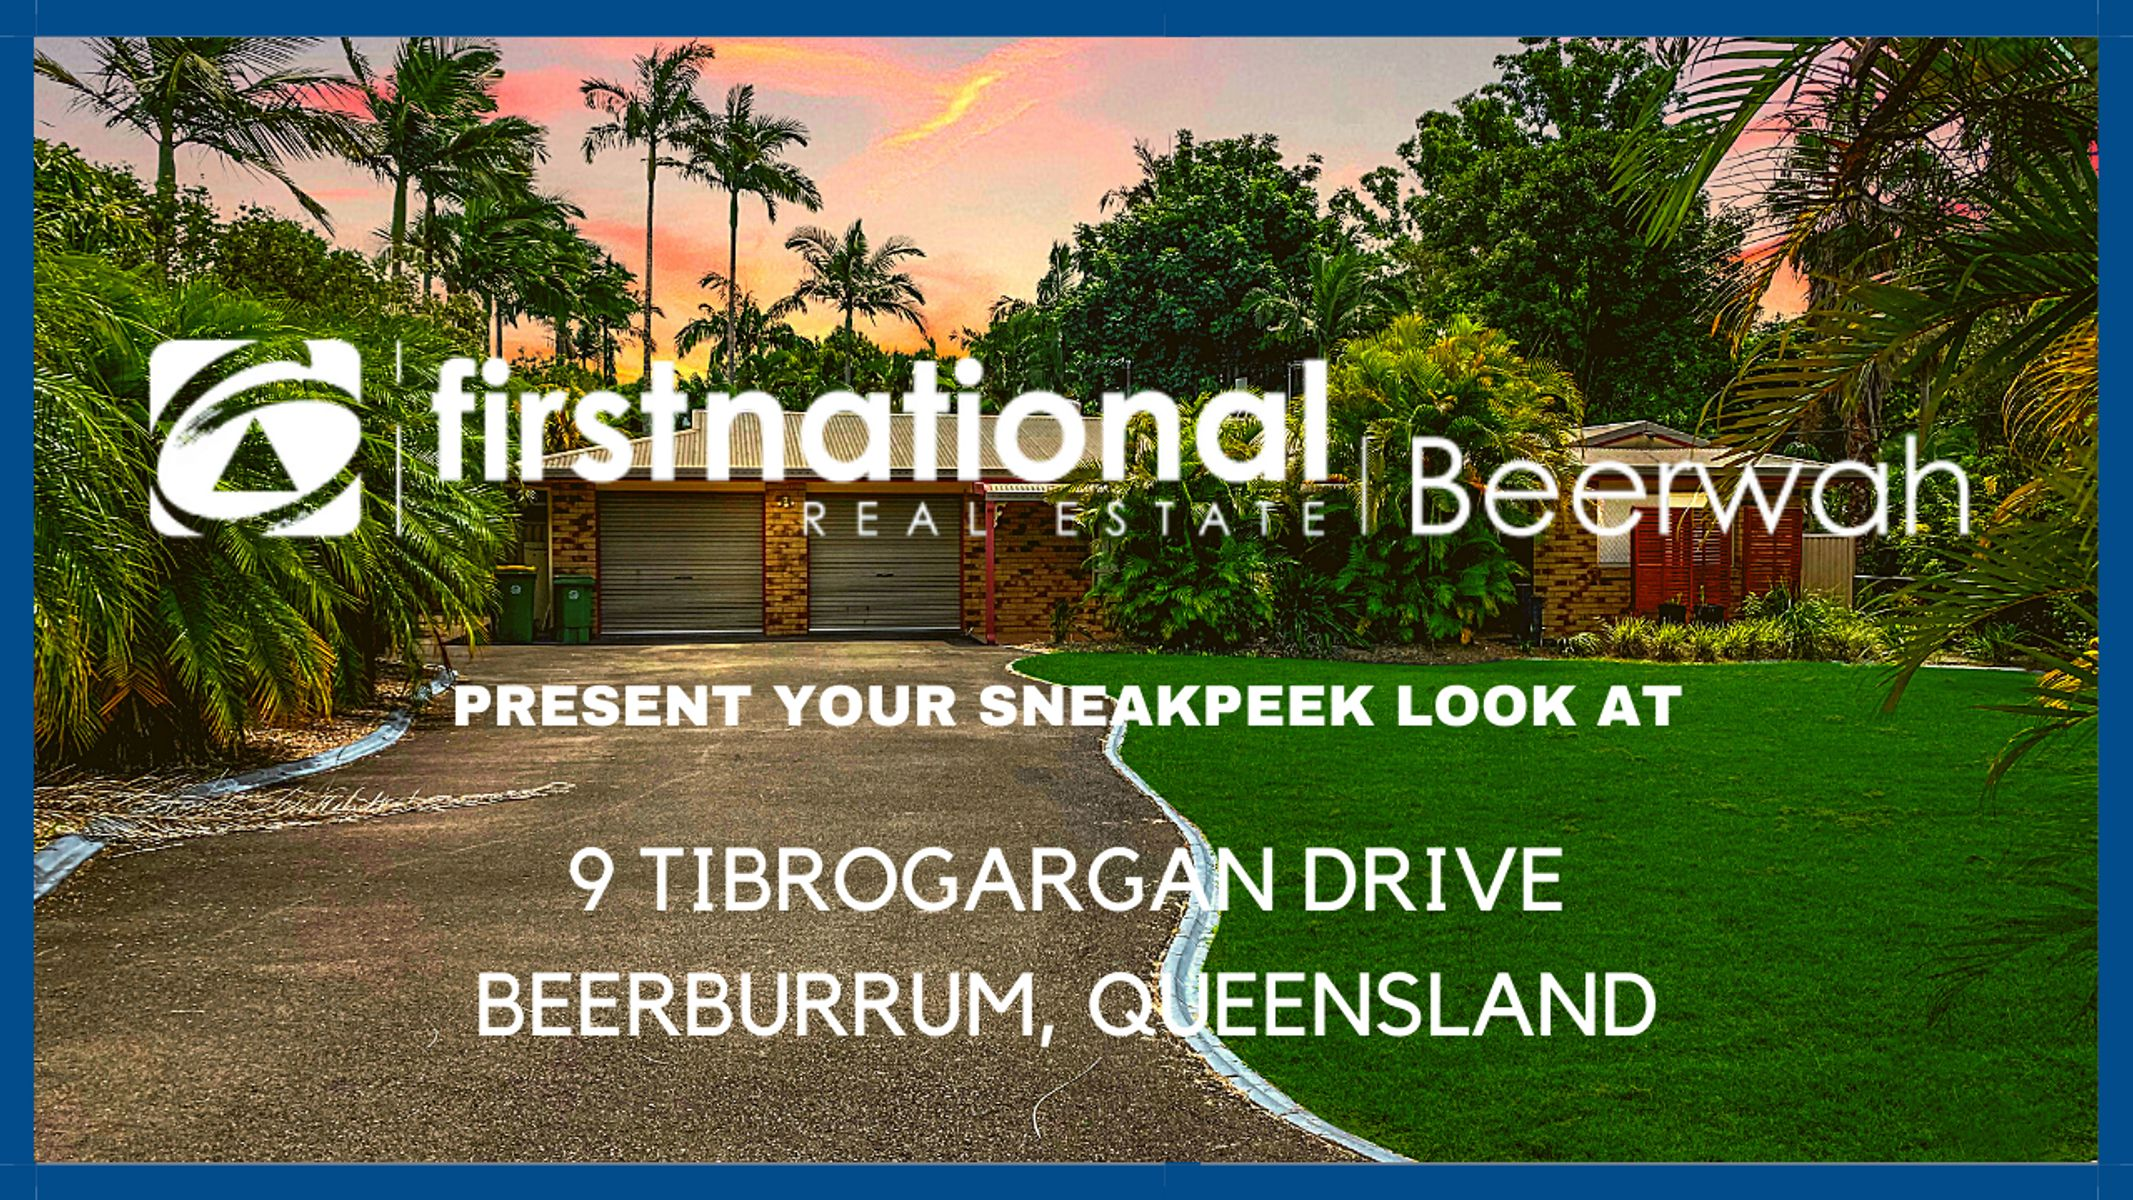 9 Tibrogargan Drive, Beerburrum, QLD 4517